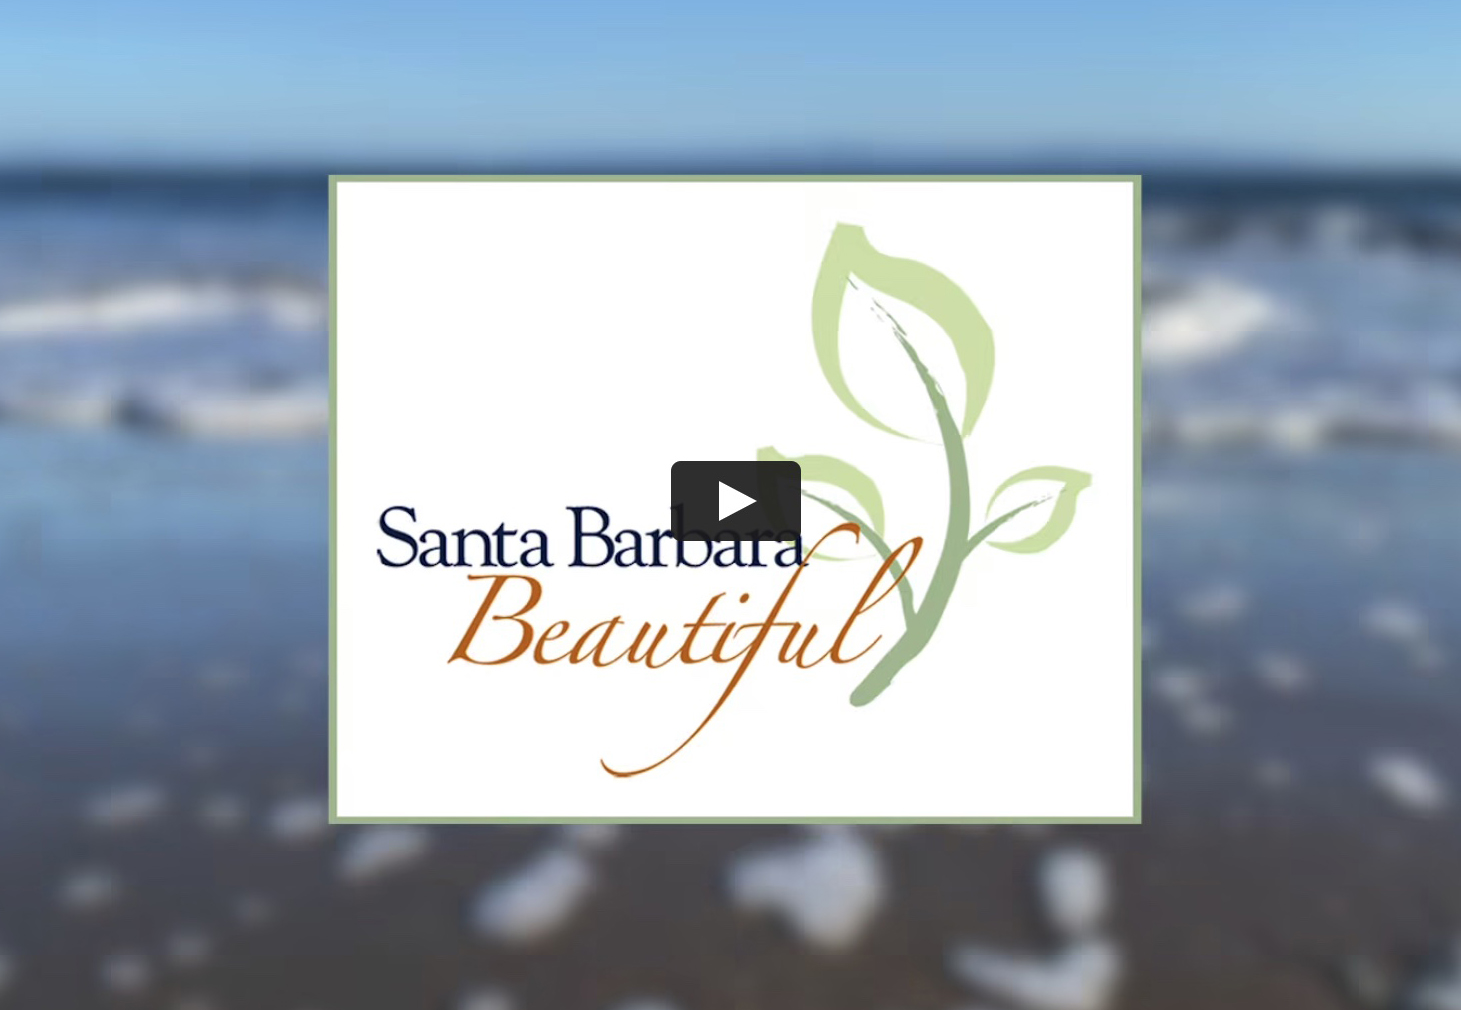 Santa Barbara Beautiful -- 2021 Video Overview